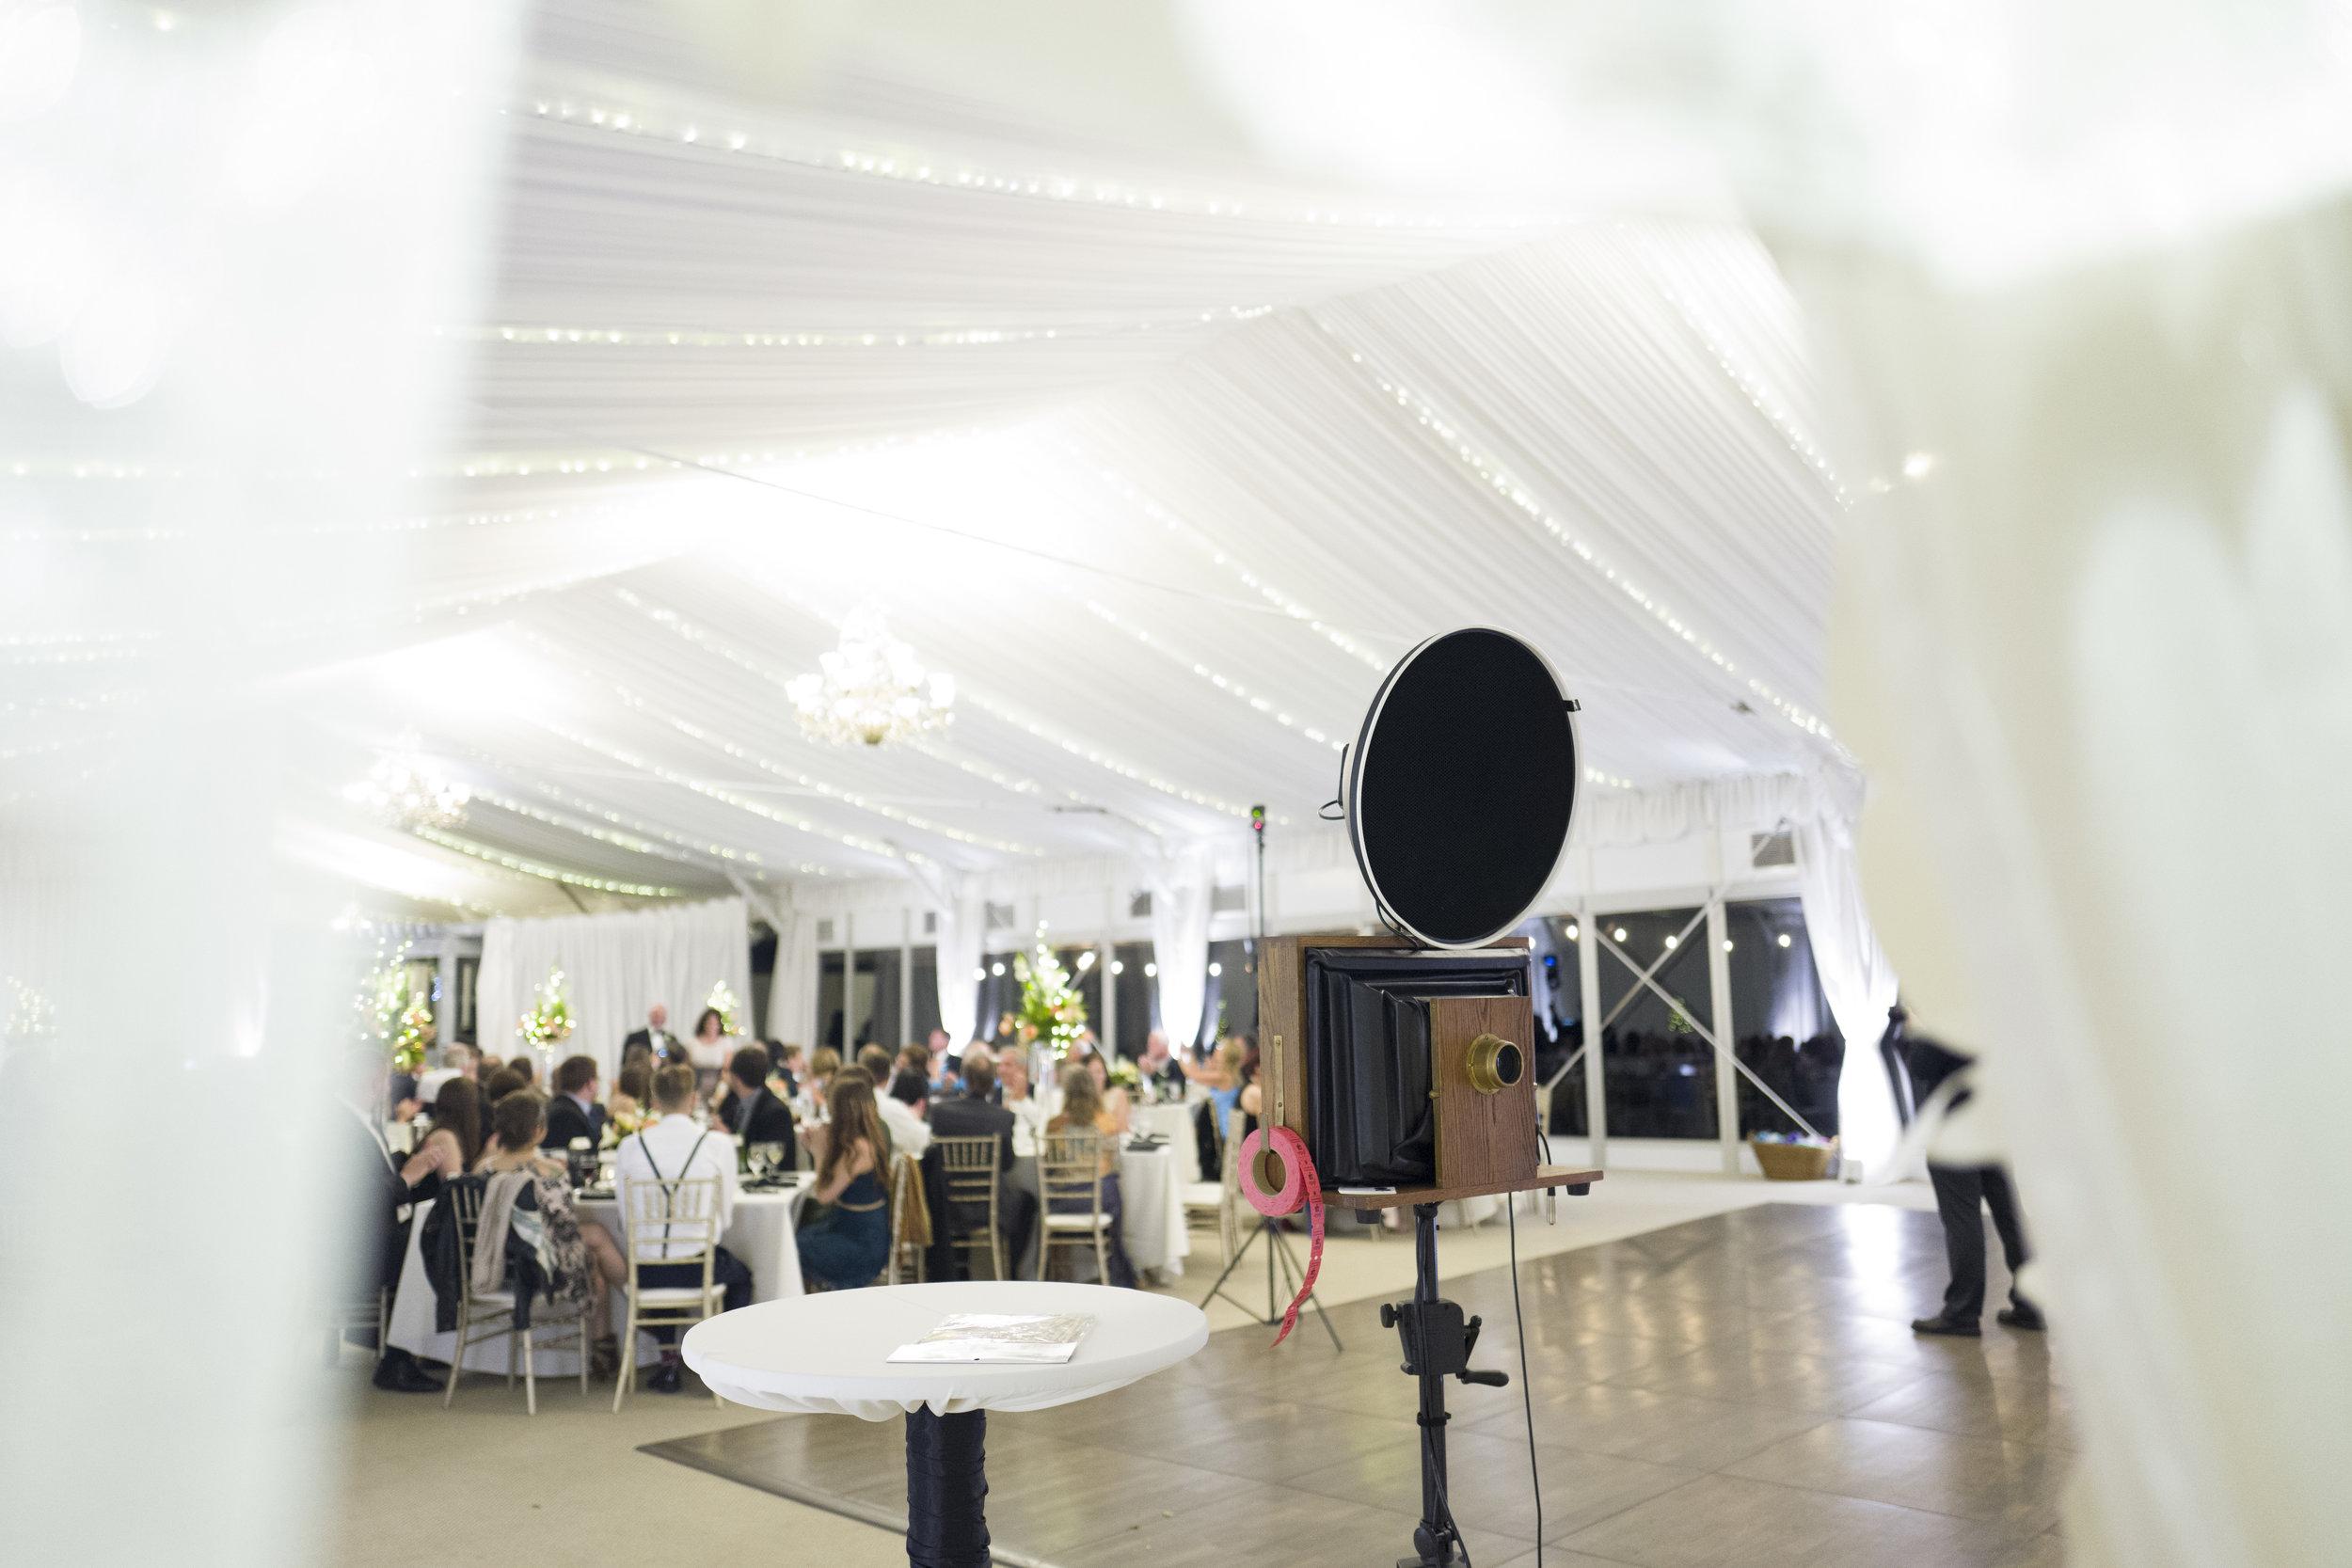 Monte_Bello_Estate_Wedding_Reception_Photo_Booth_Lemont